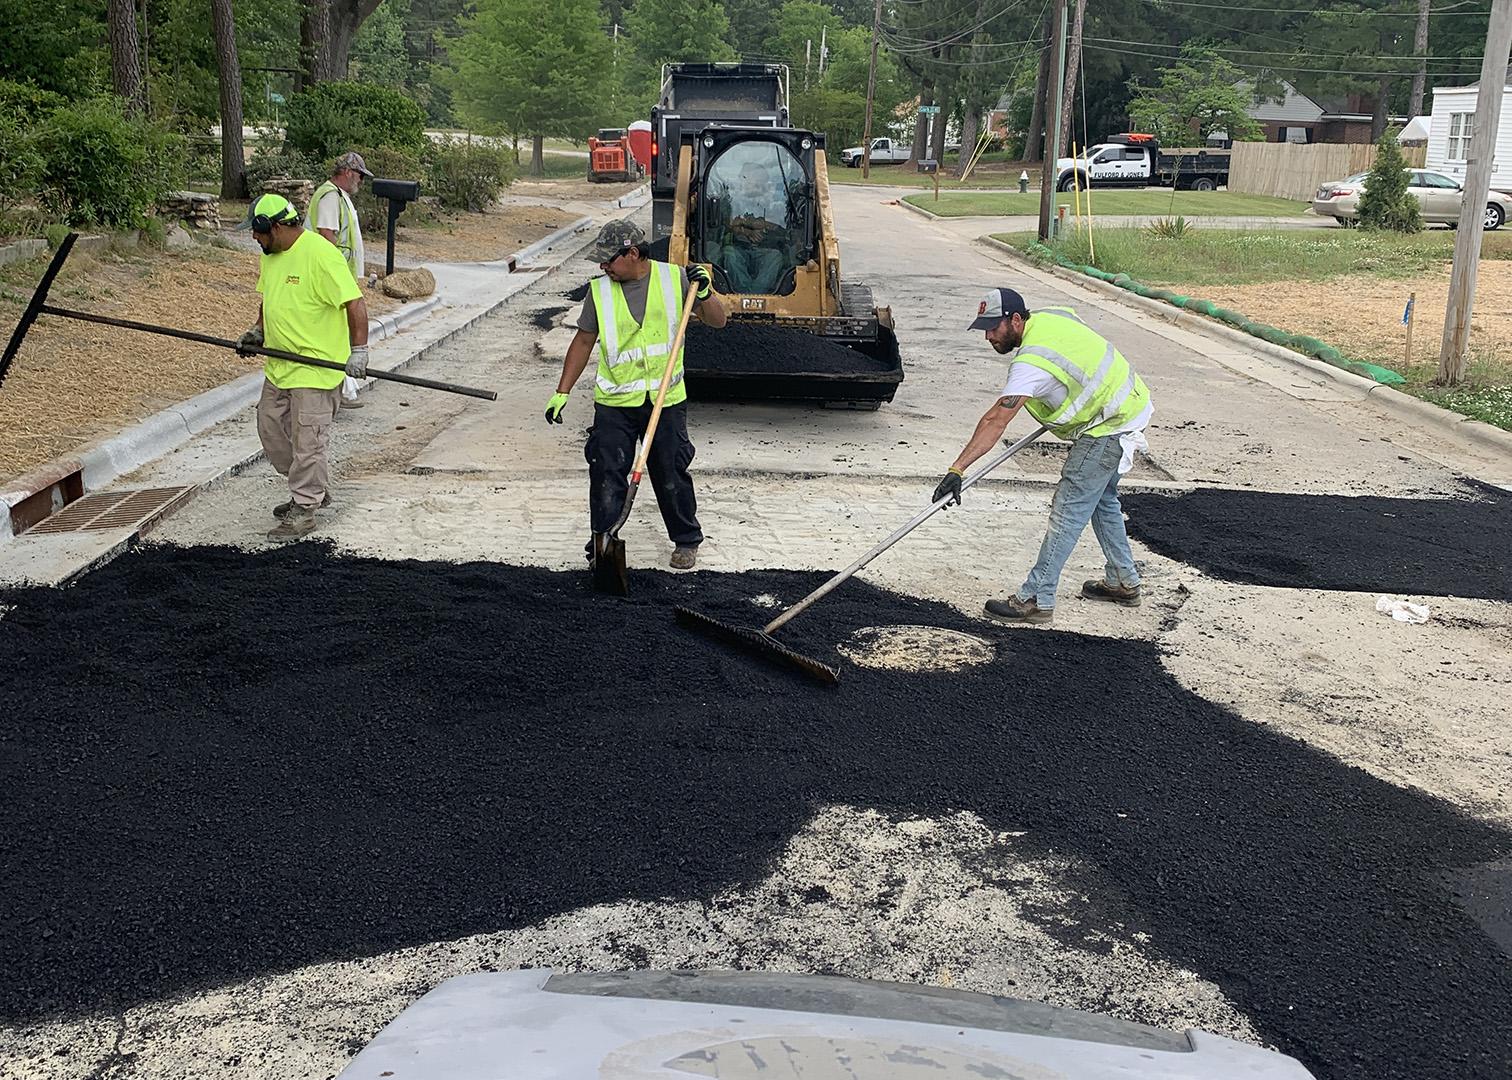 Worker spread hot asphalt during a street repair in North Carolina.